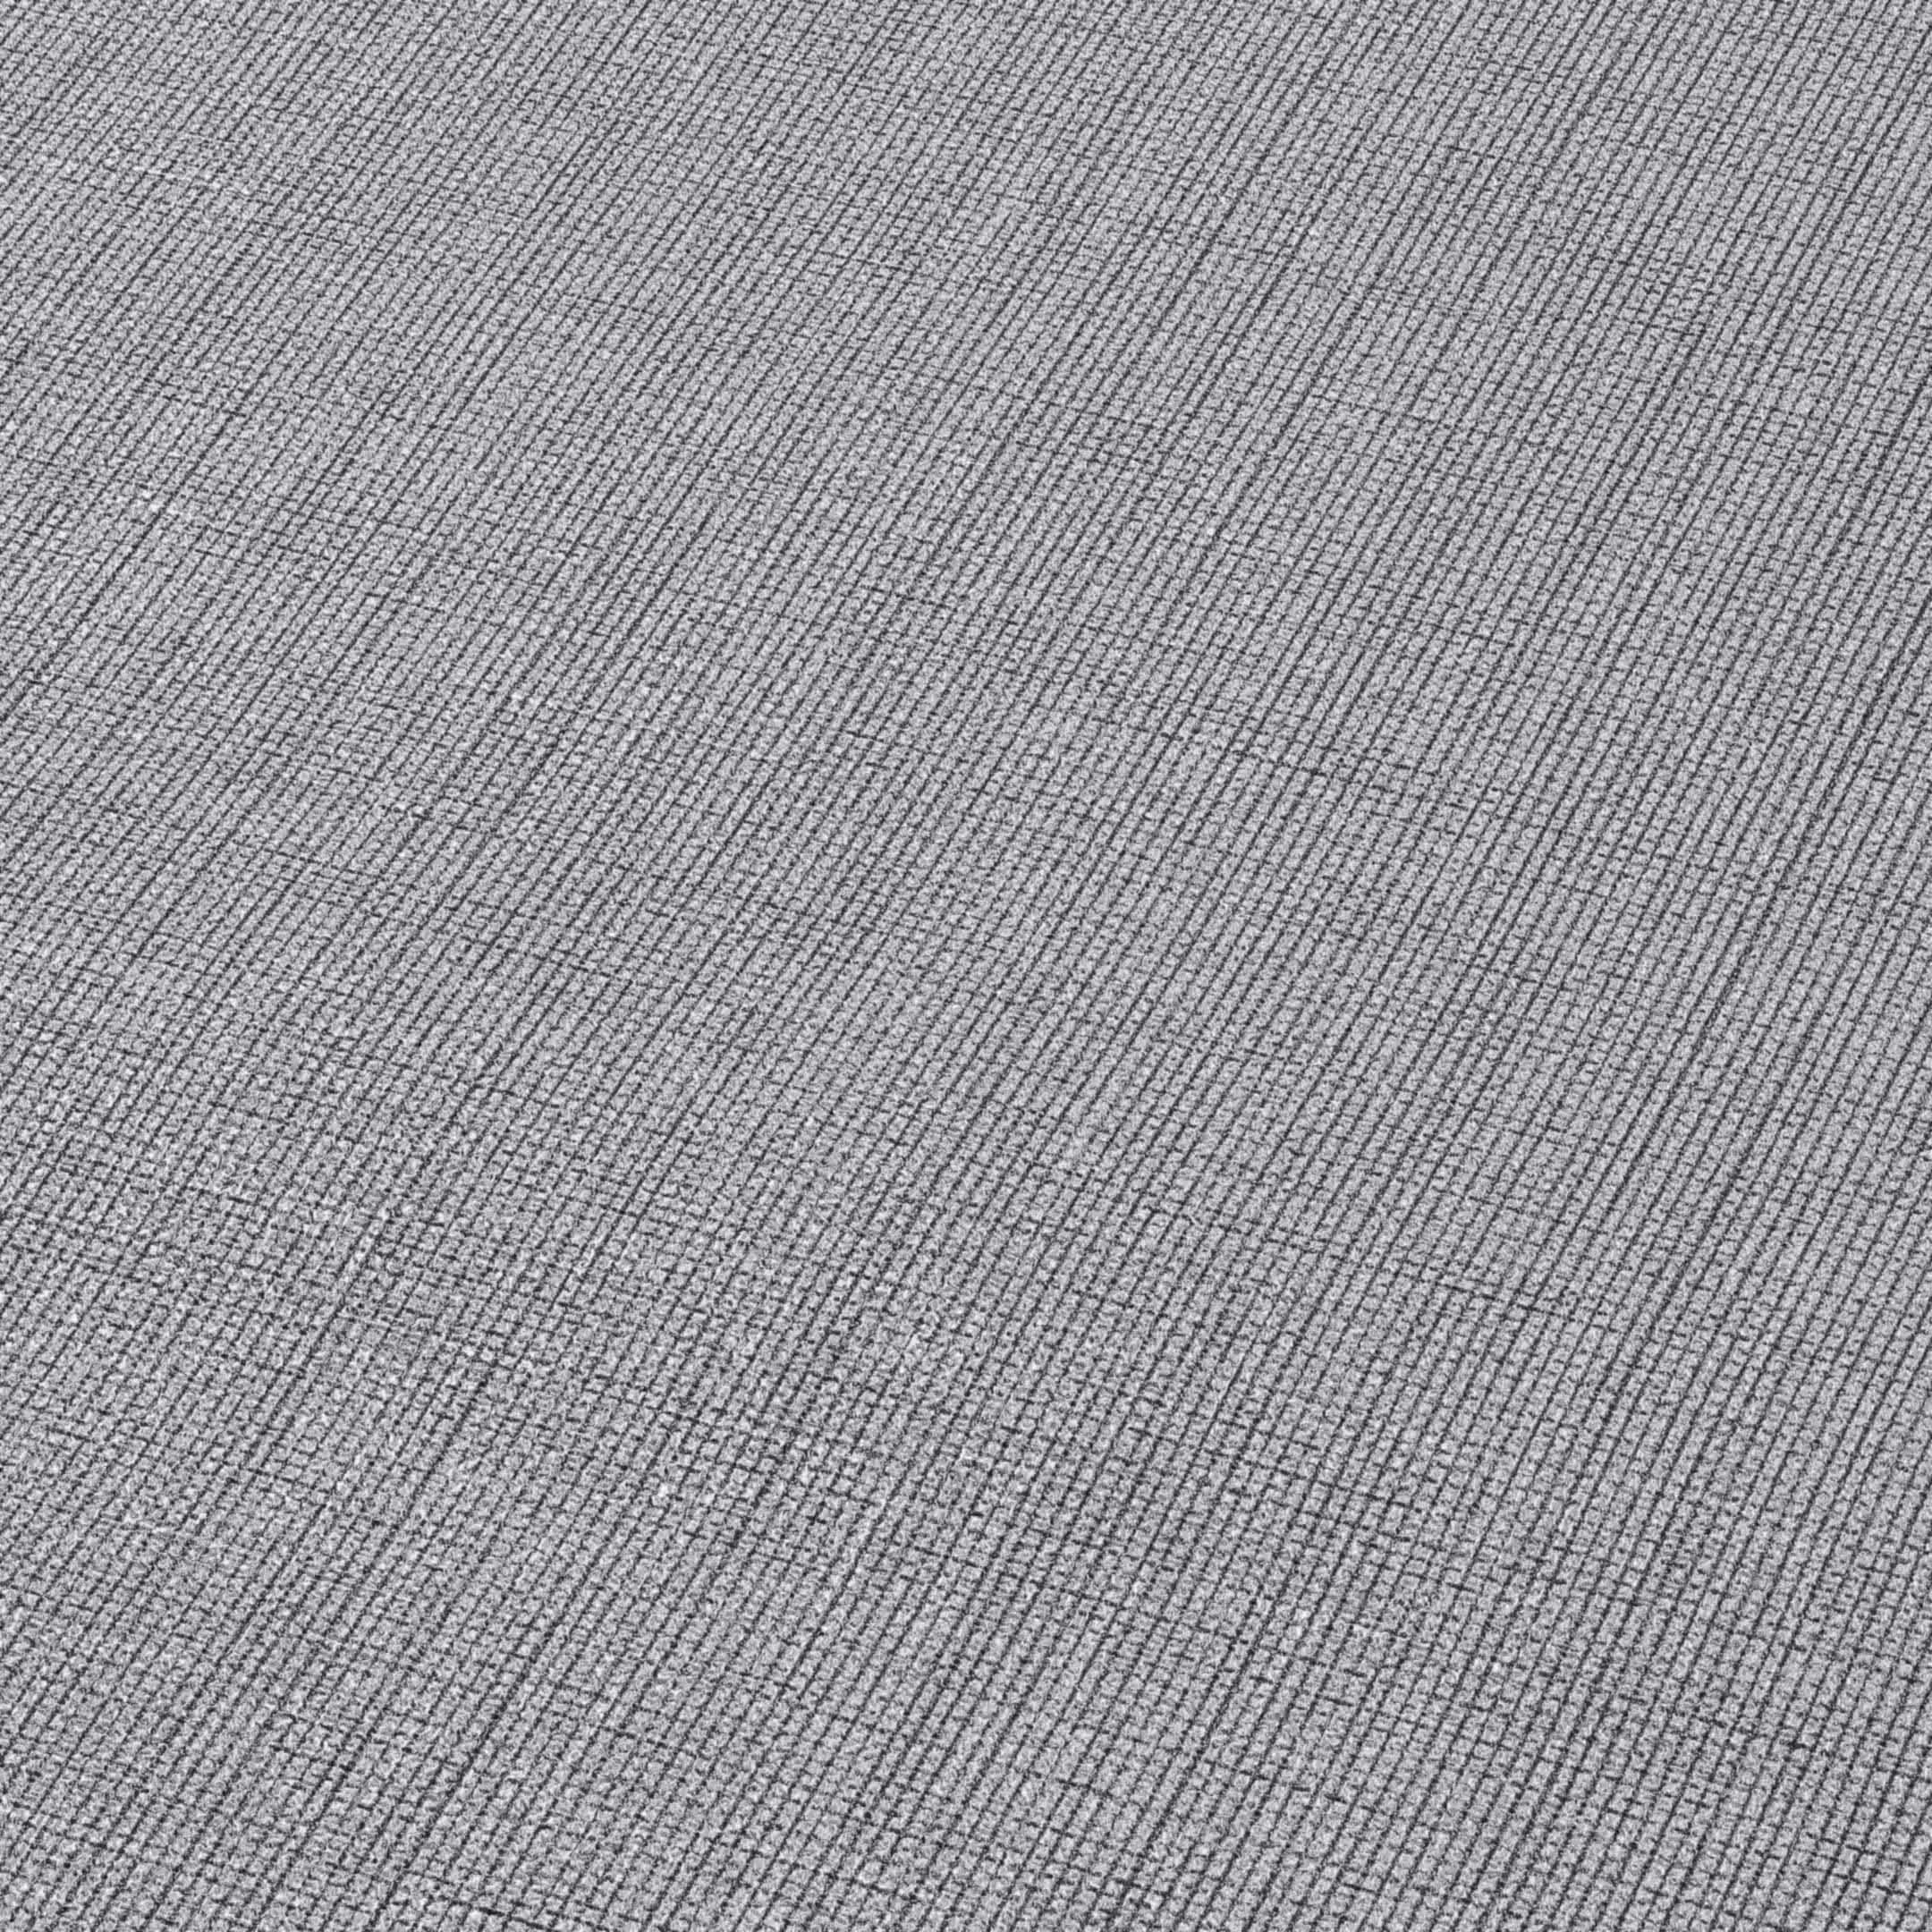 Обои виниловые на флизелиновой основе MaxWall Vila Rosa 159020-07 (1,06х10 м) фото